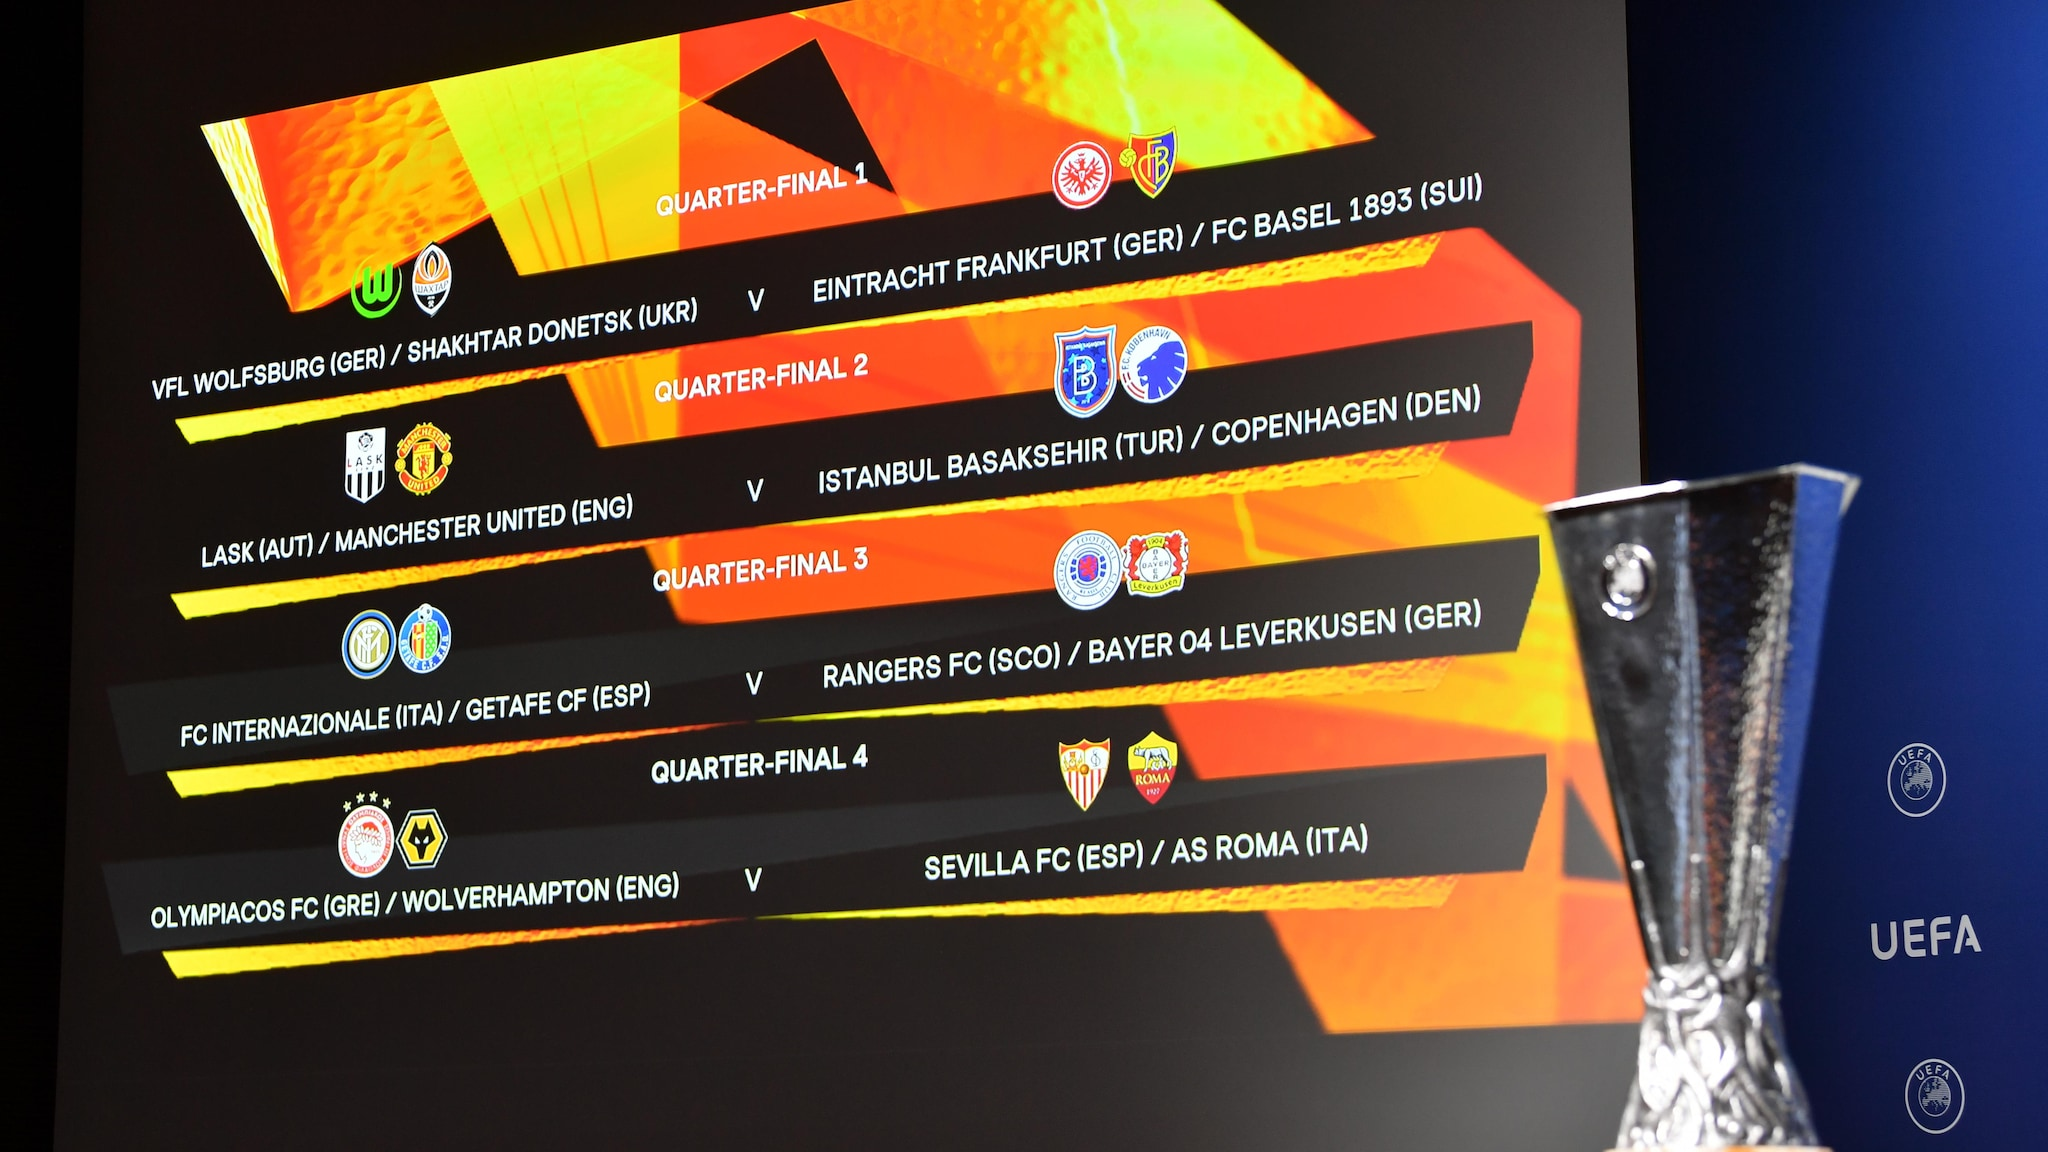 europa league quarter final and semi final draws and schedule uefa europa league uefa com europa league quarter final and semi